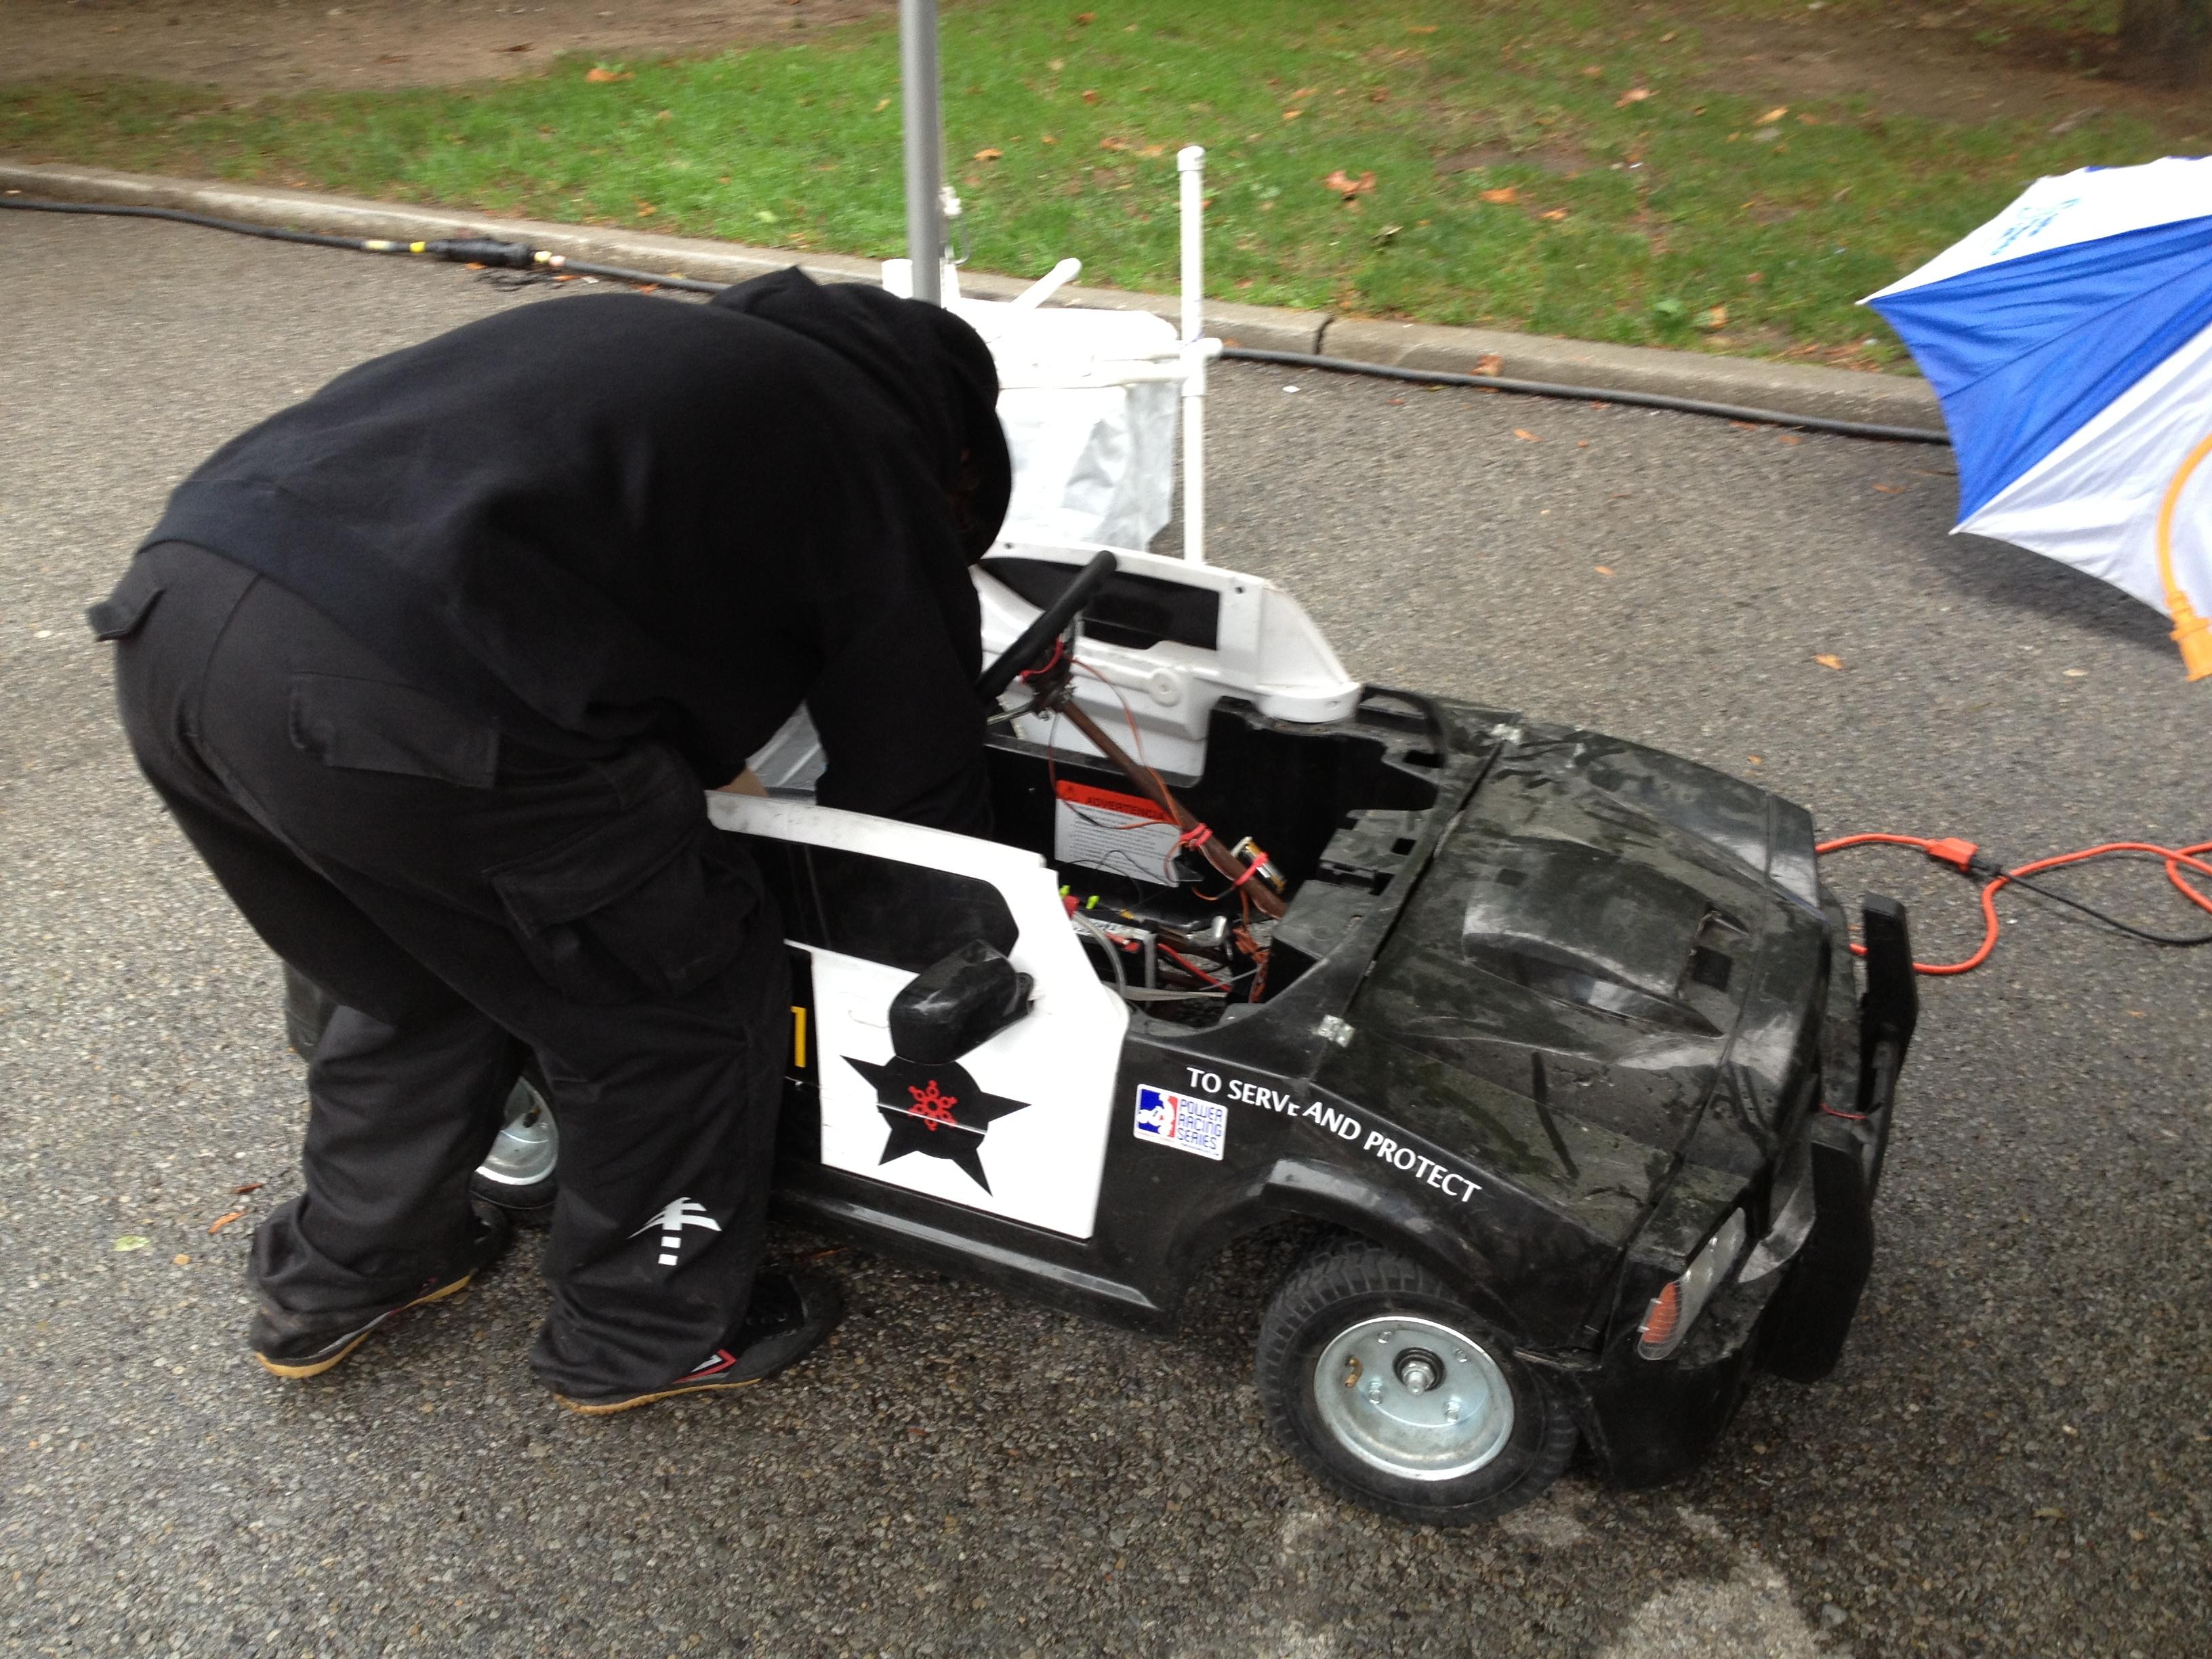 Gentlehackers, Start Your Engines! Power Racing at Maker Faire